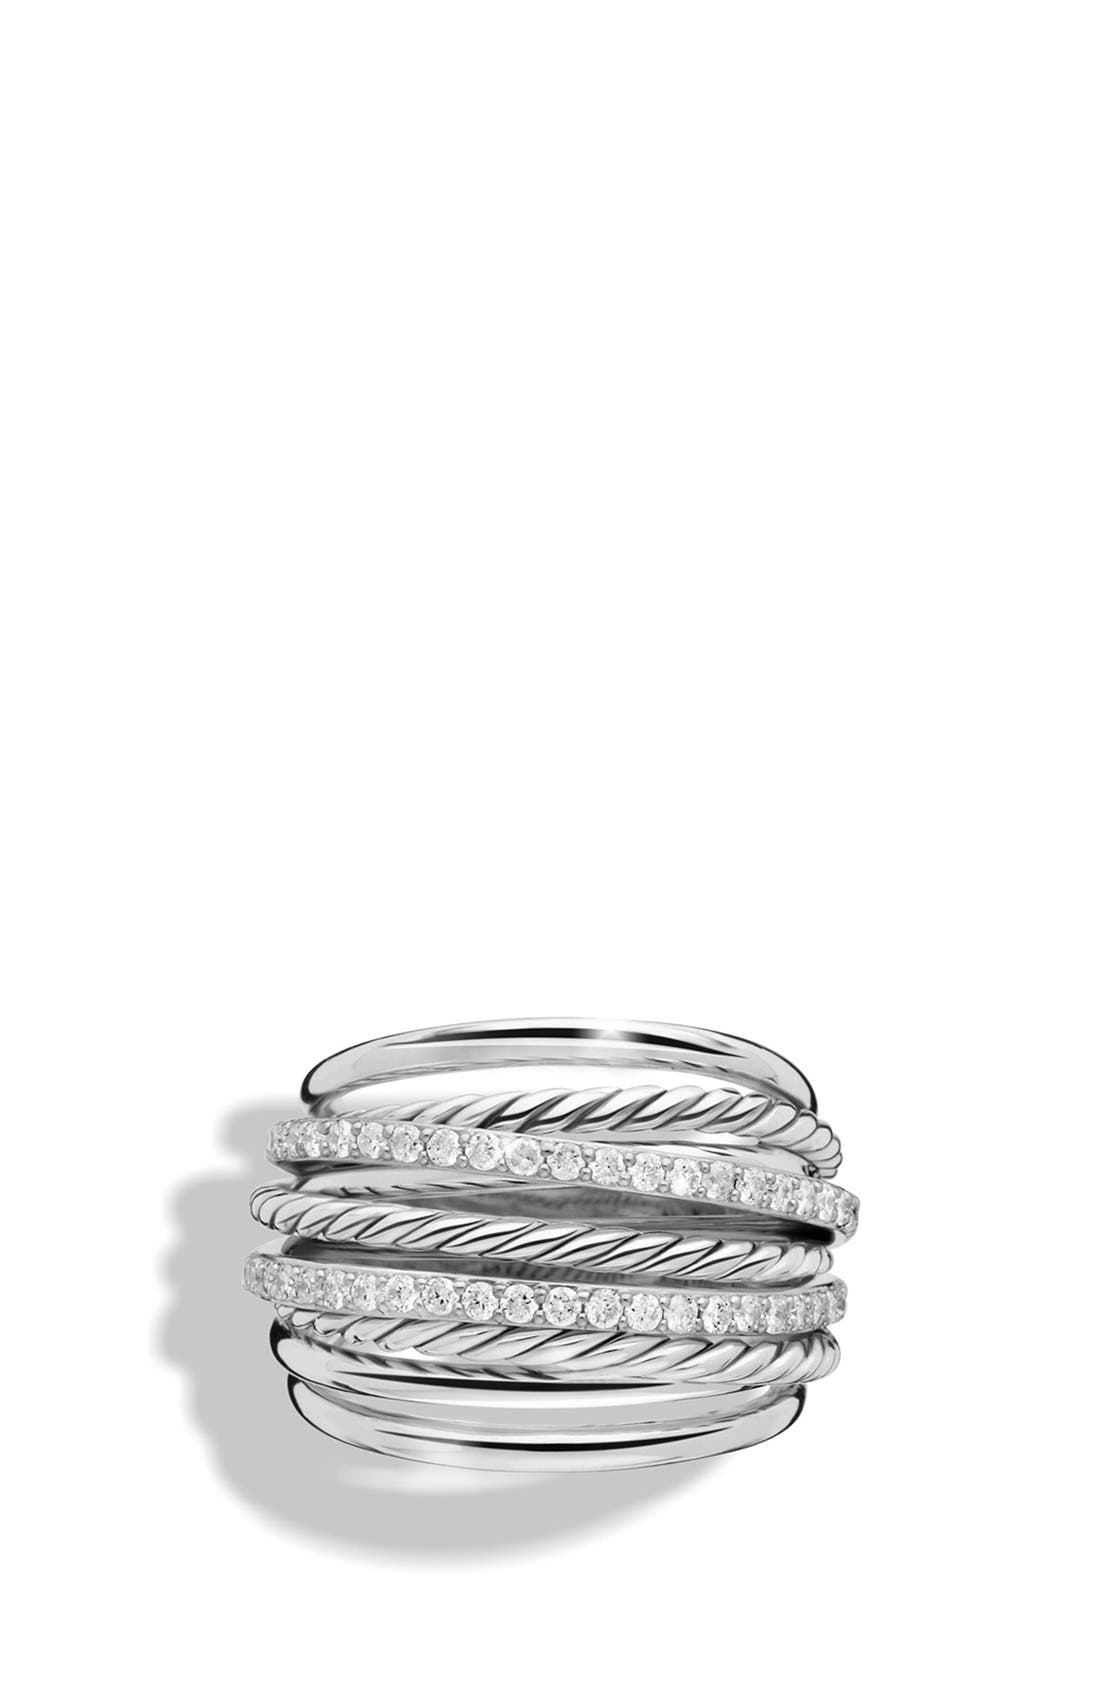 Alternate Image 2  - David Yurman 'Crossover' Dome Ring with Diamonds